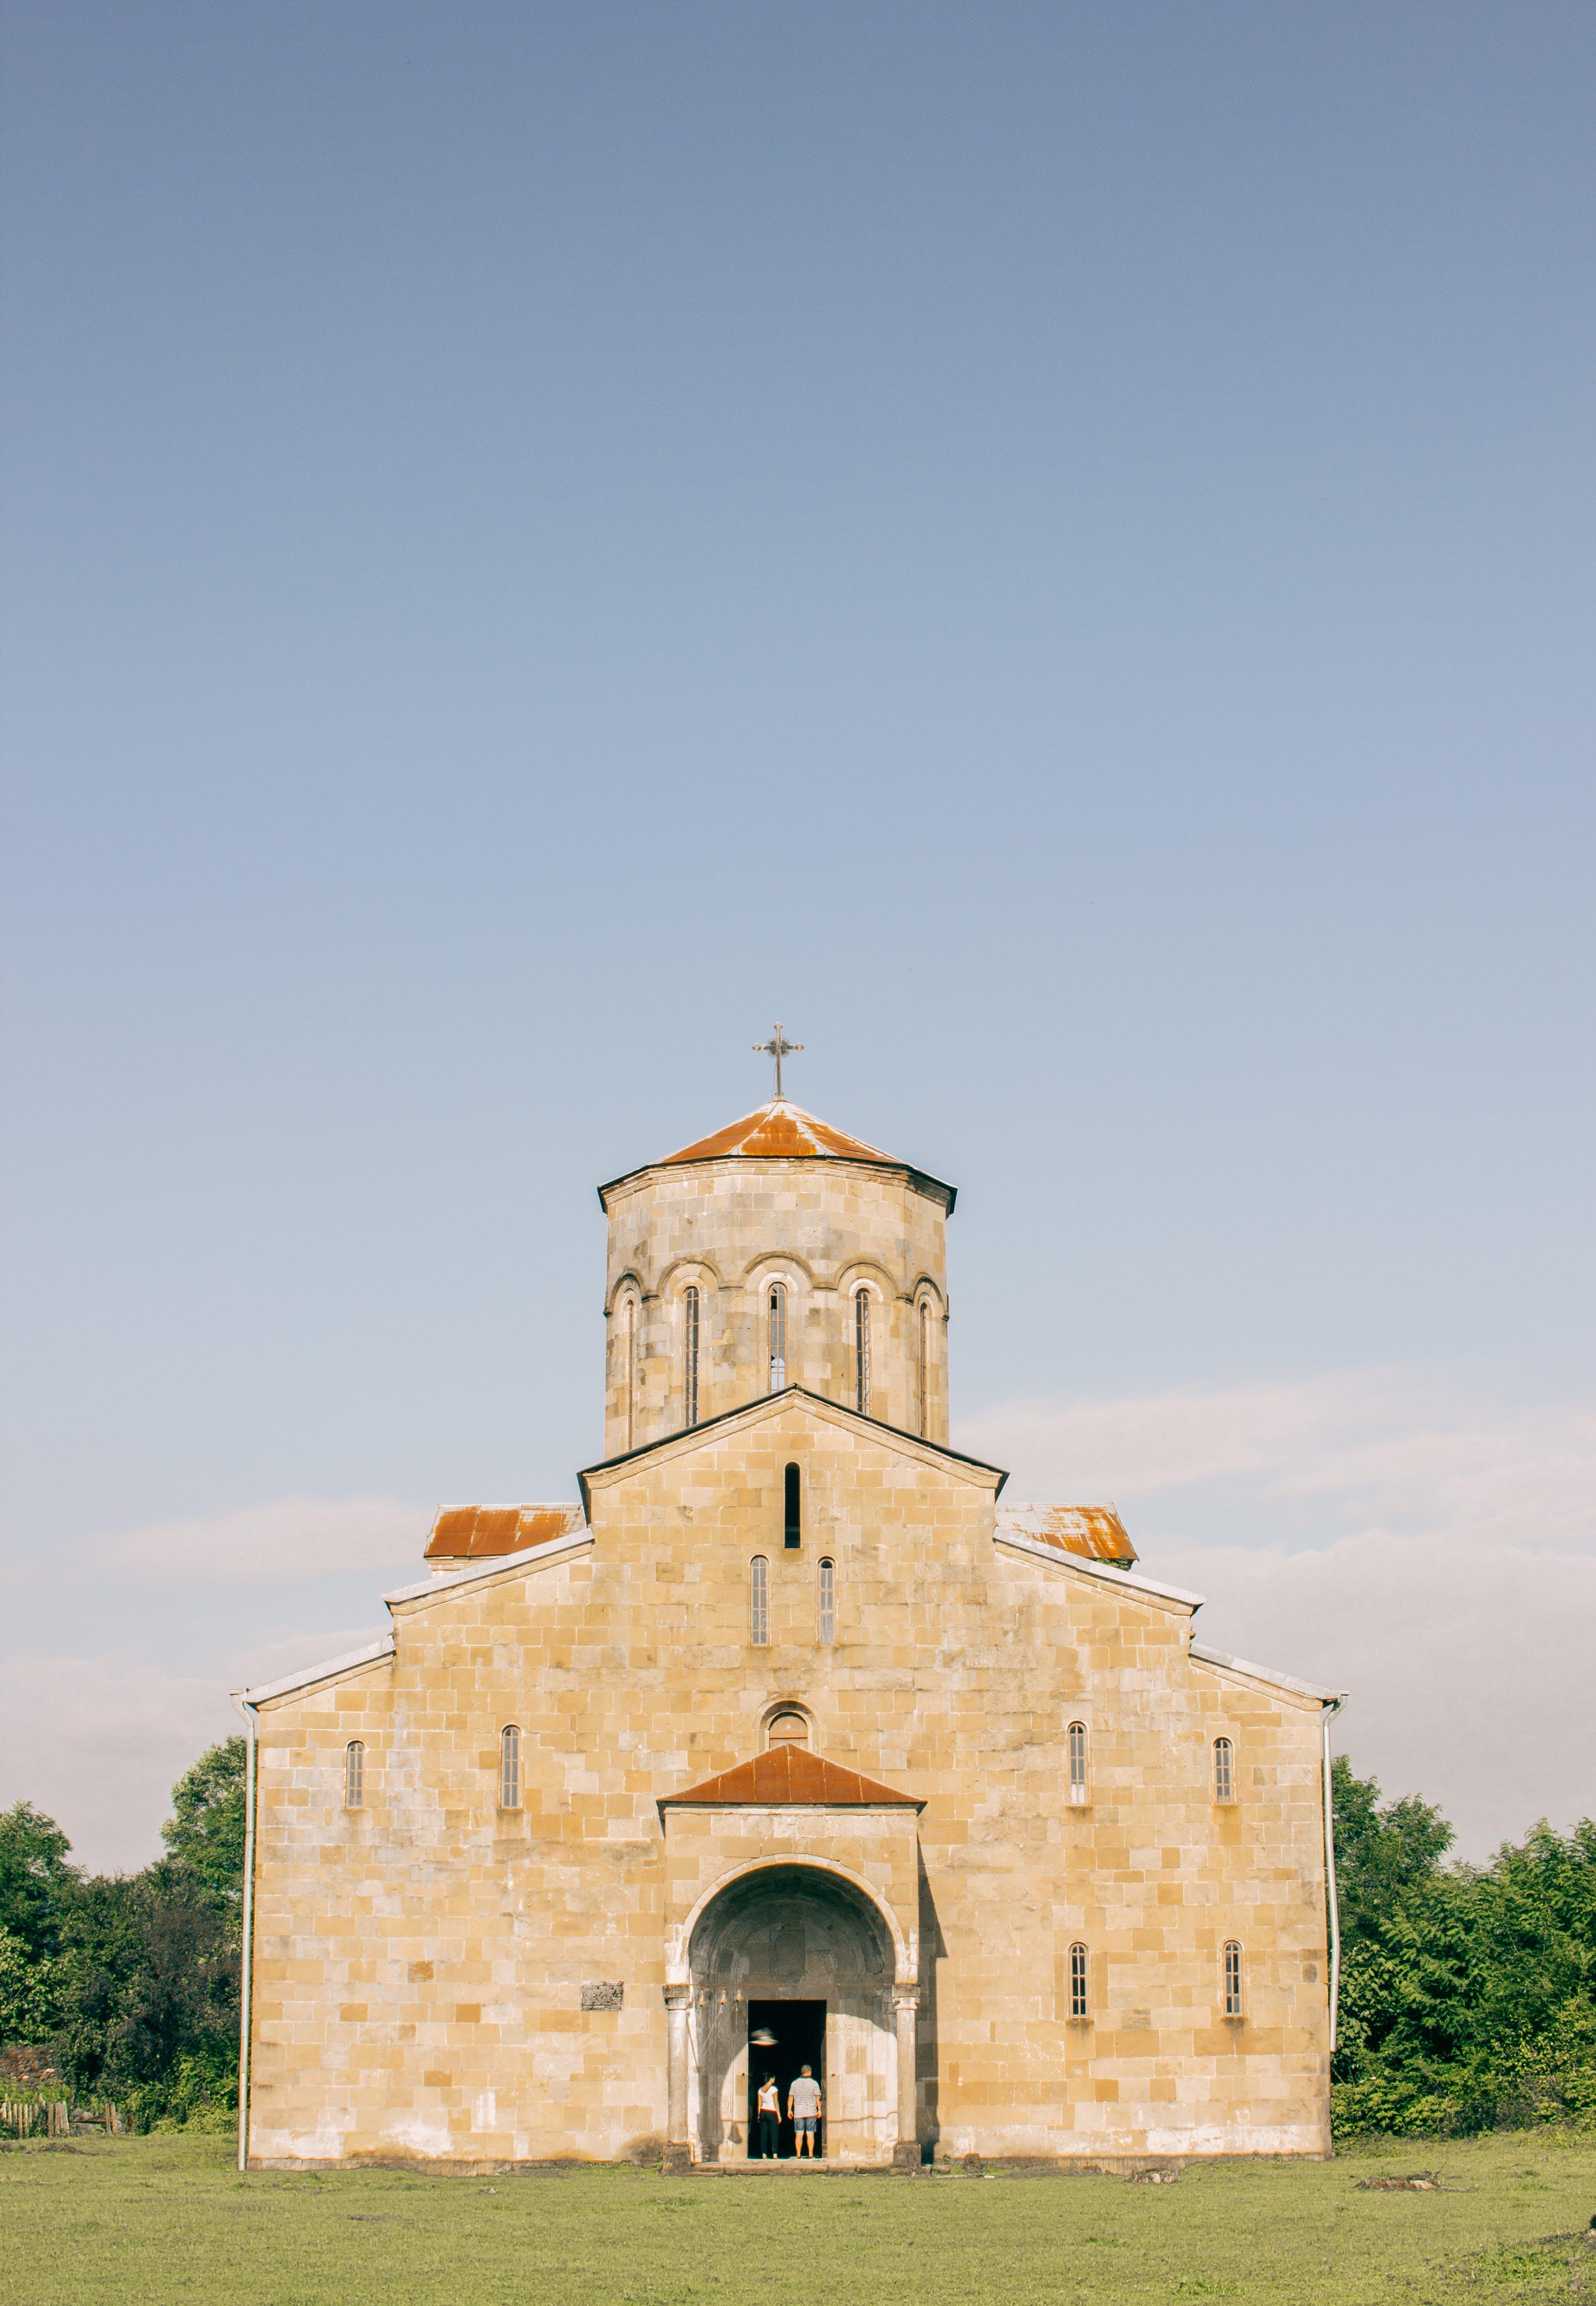 Brown and Orange Church